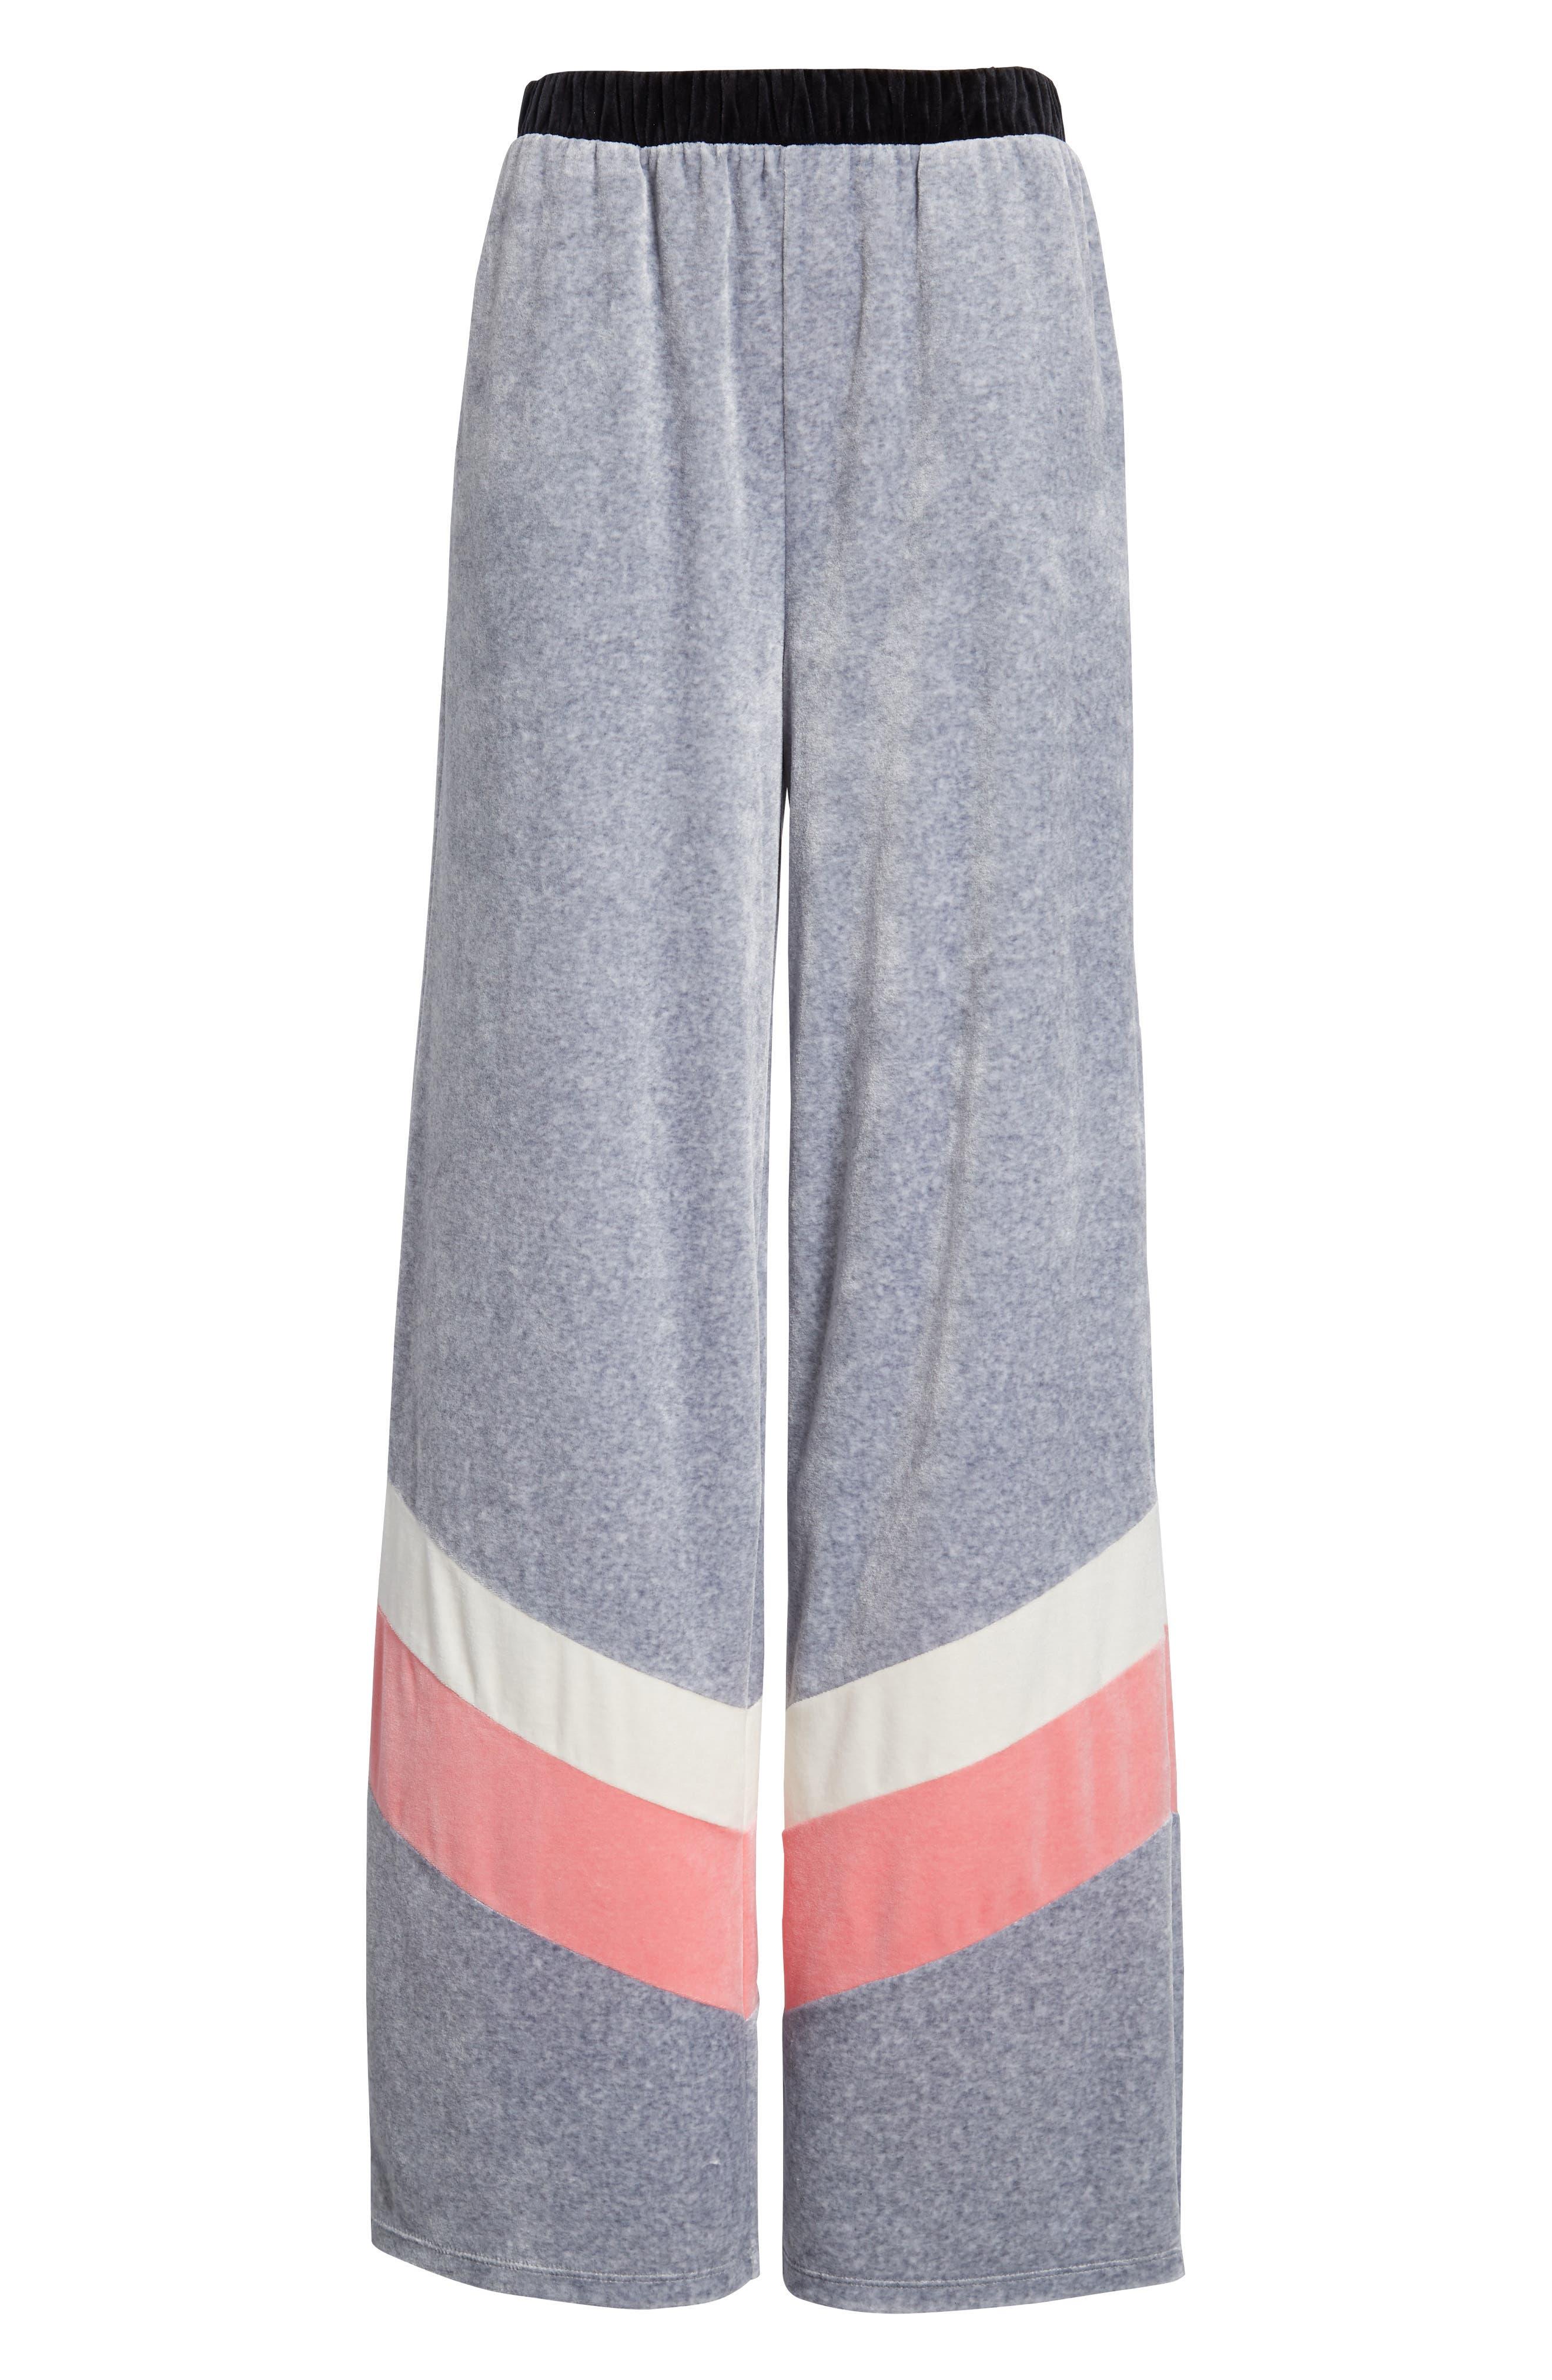 Colorblock Velour Wide Leg Pants,                             Alternate thumbnail 7, color,                             Silver Lining Angel Combo